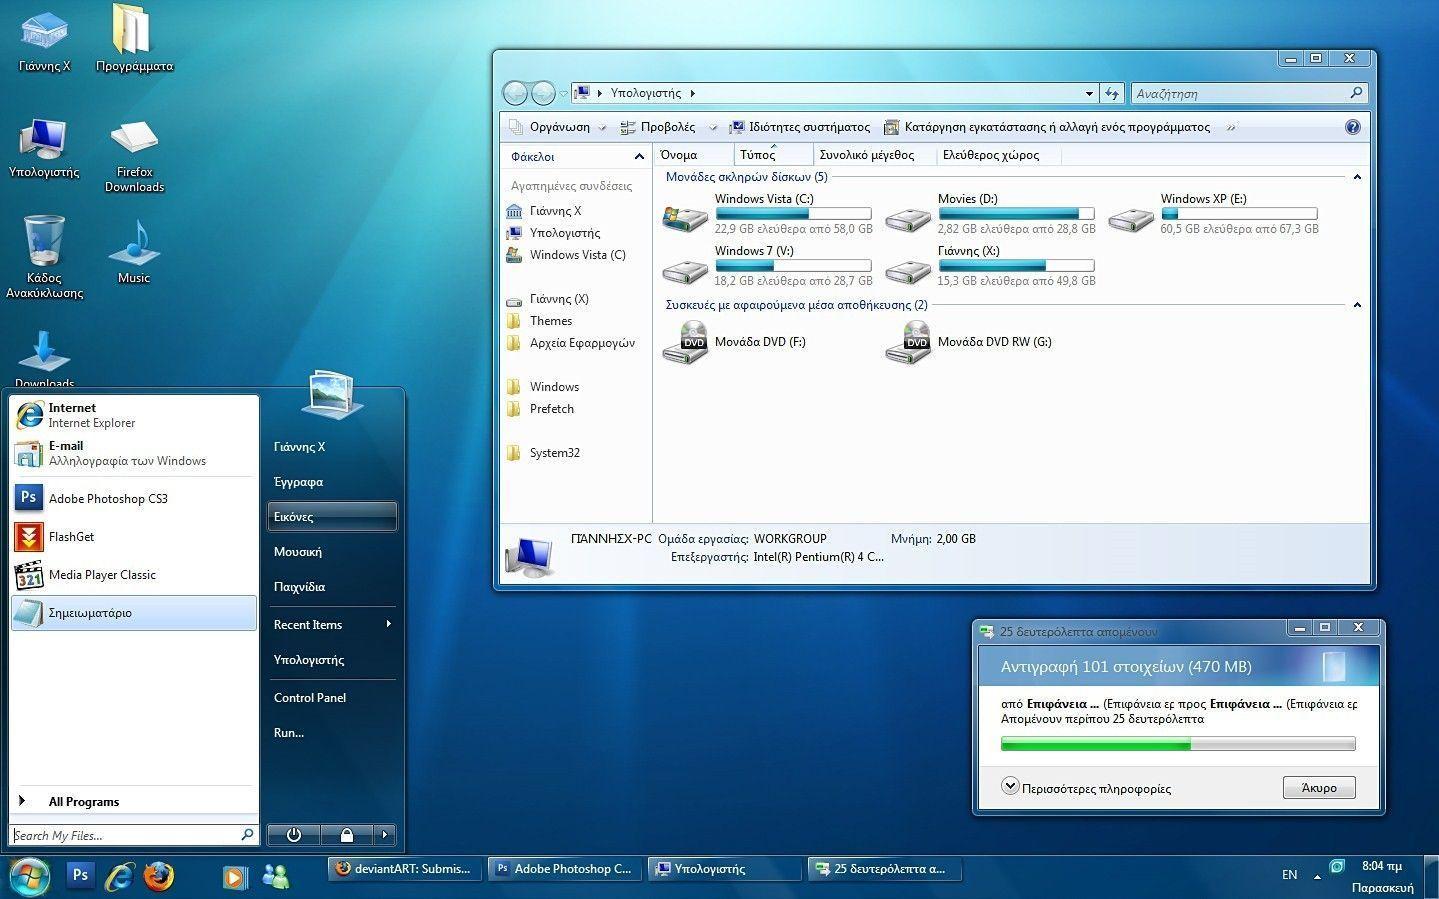 Top Windows 7 Problems